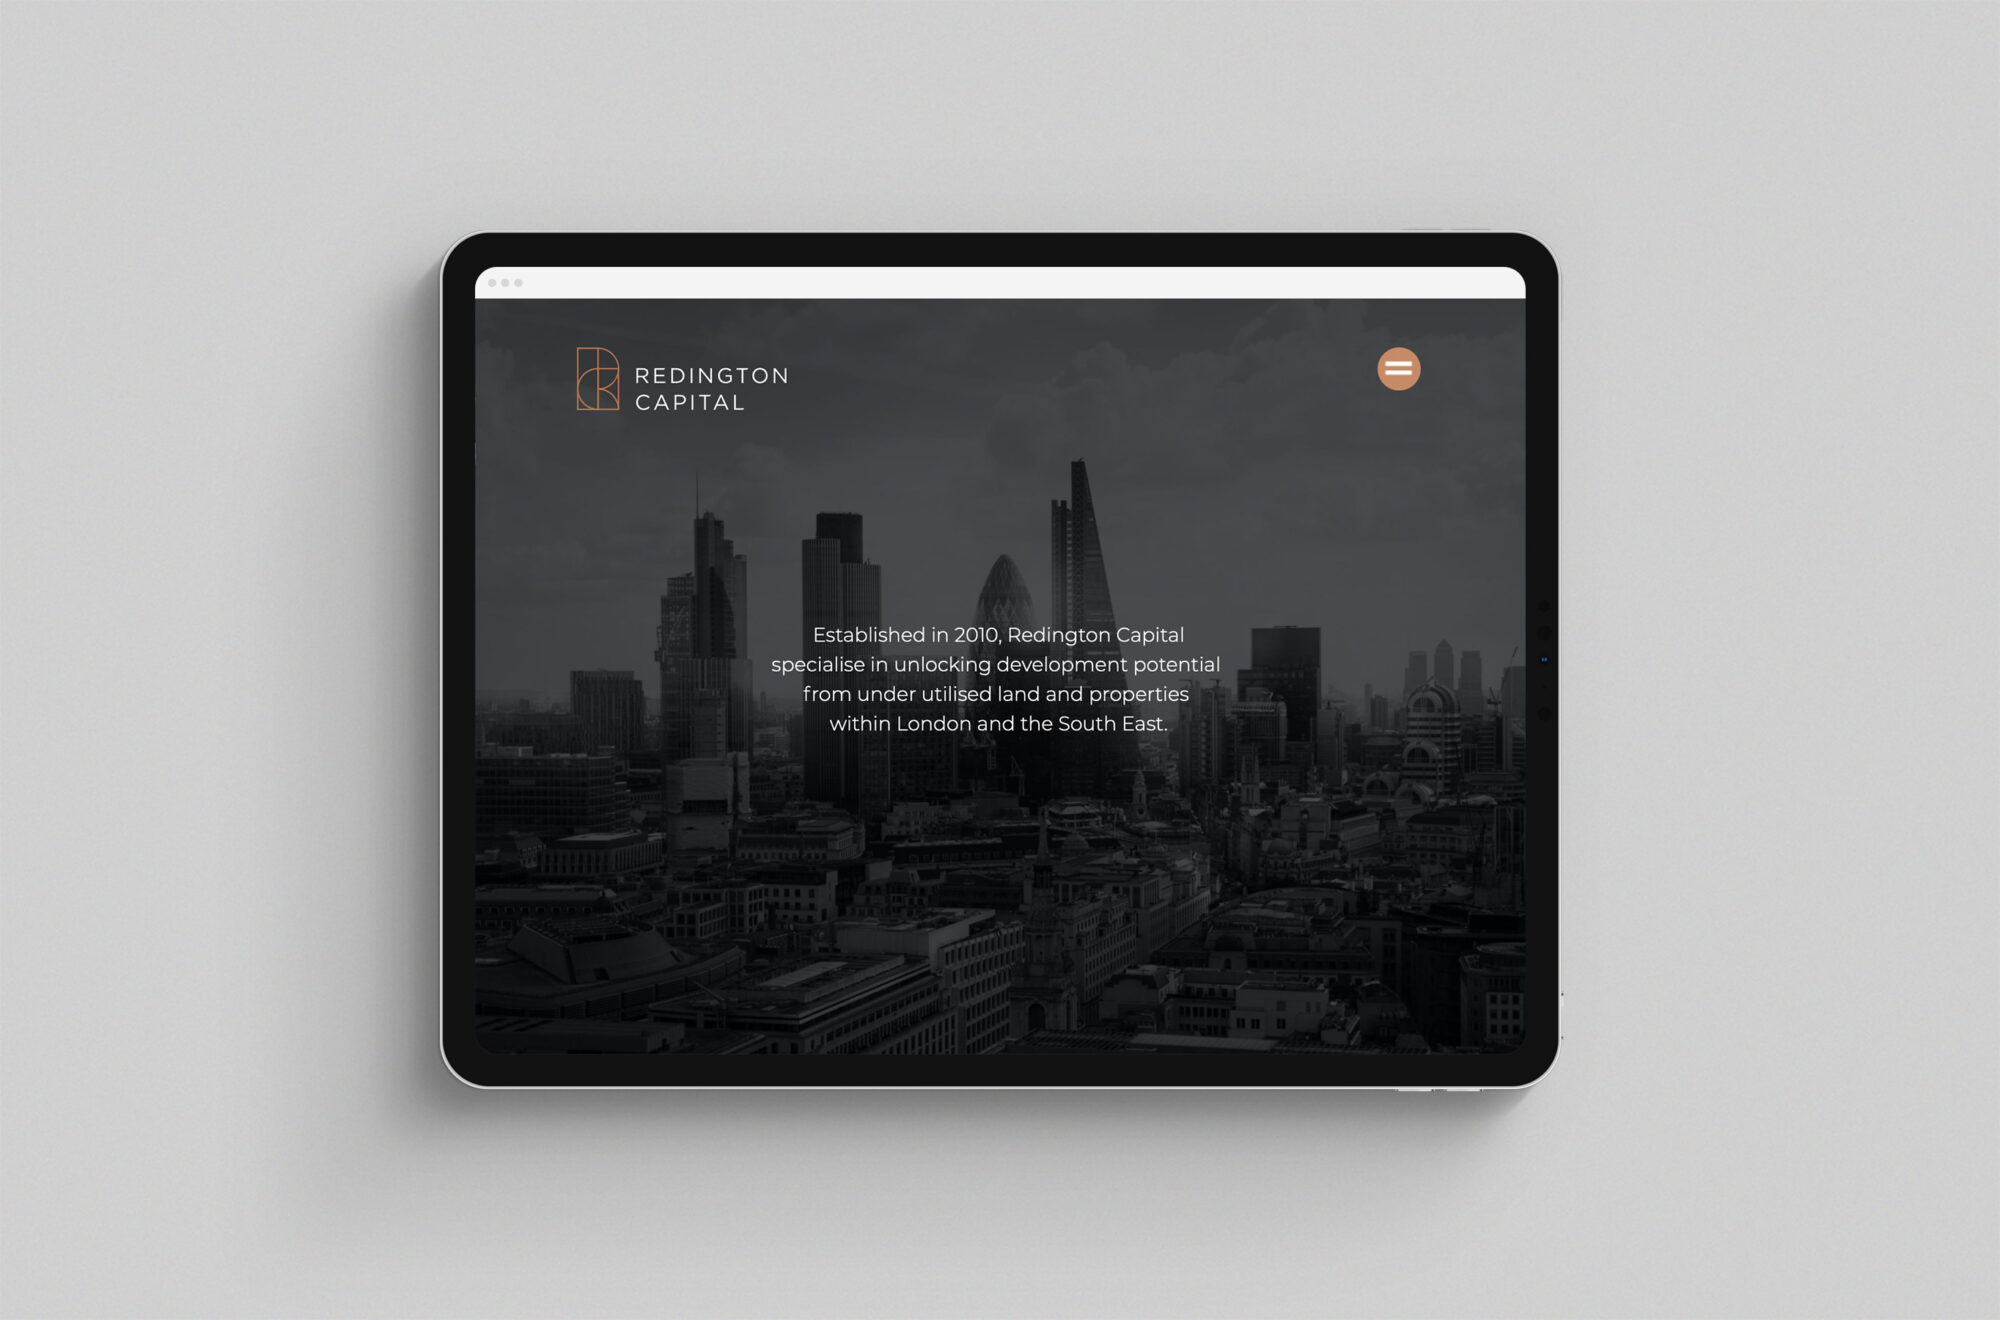 Redington Capital website ipad view